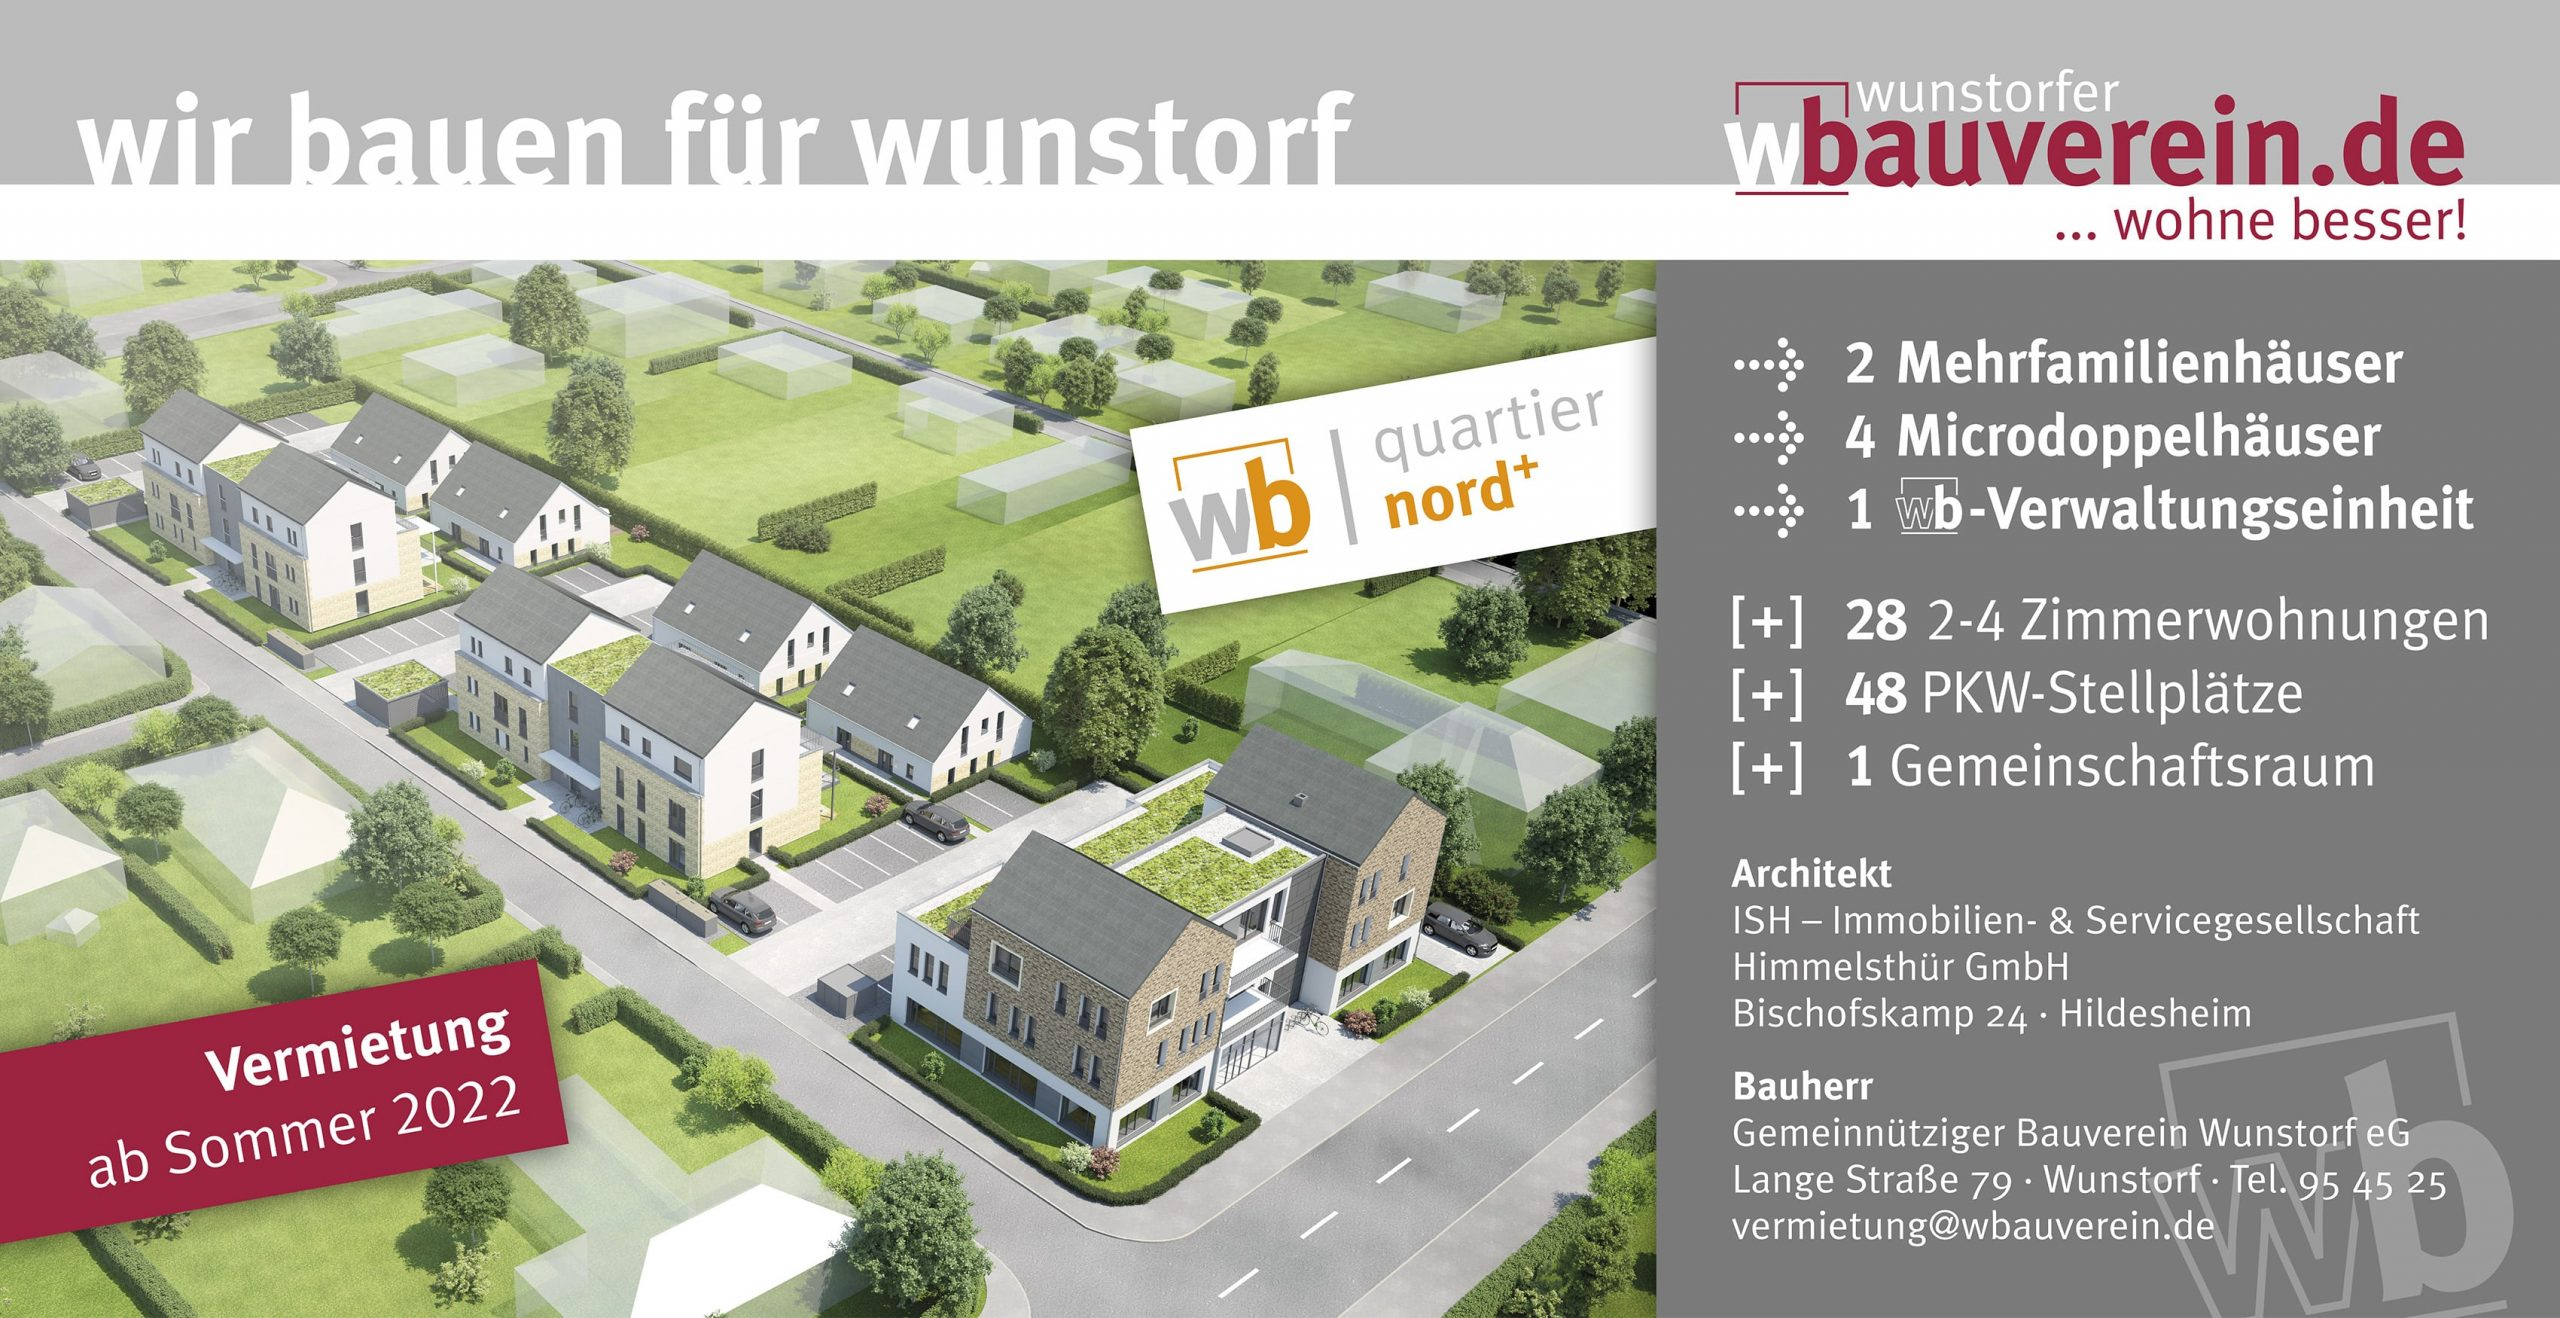 Bauprojekte - Quartier nord⁺